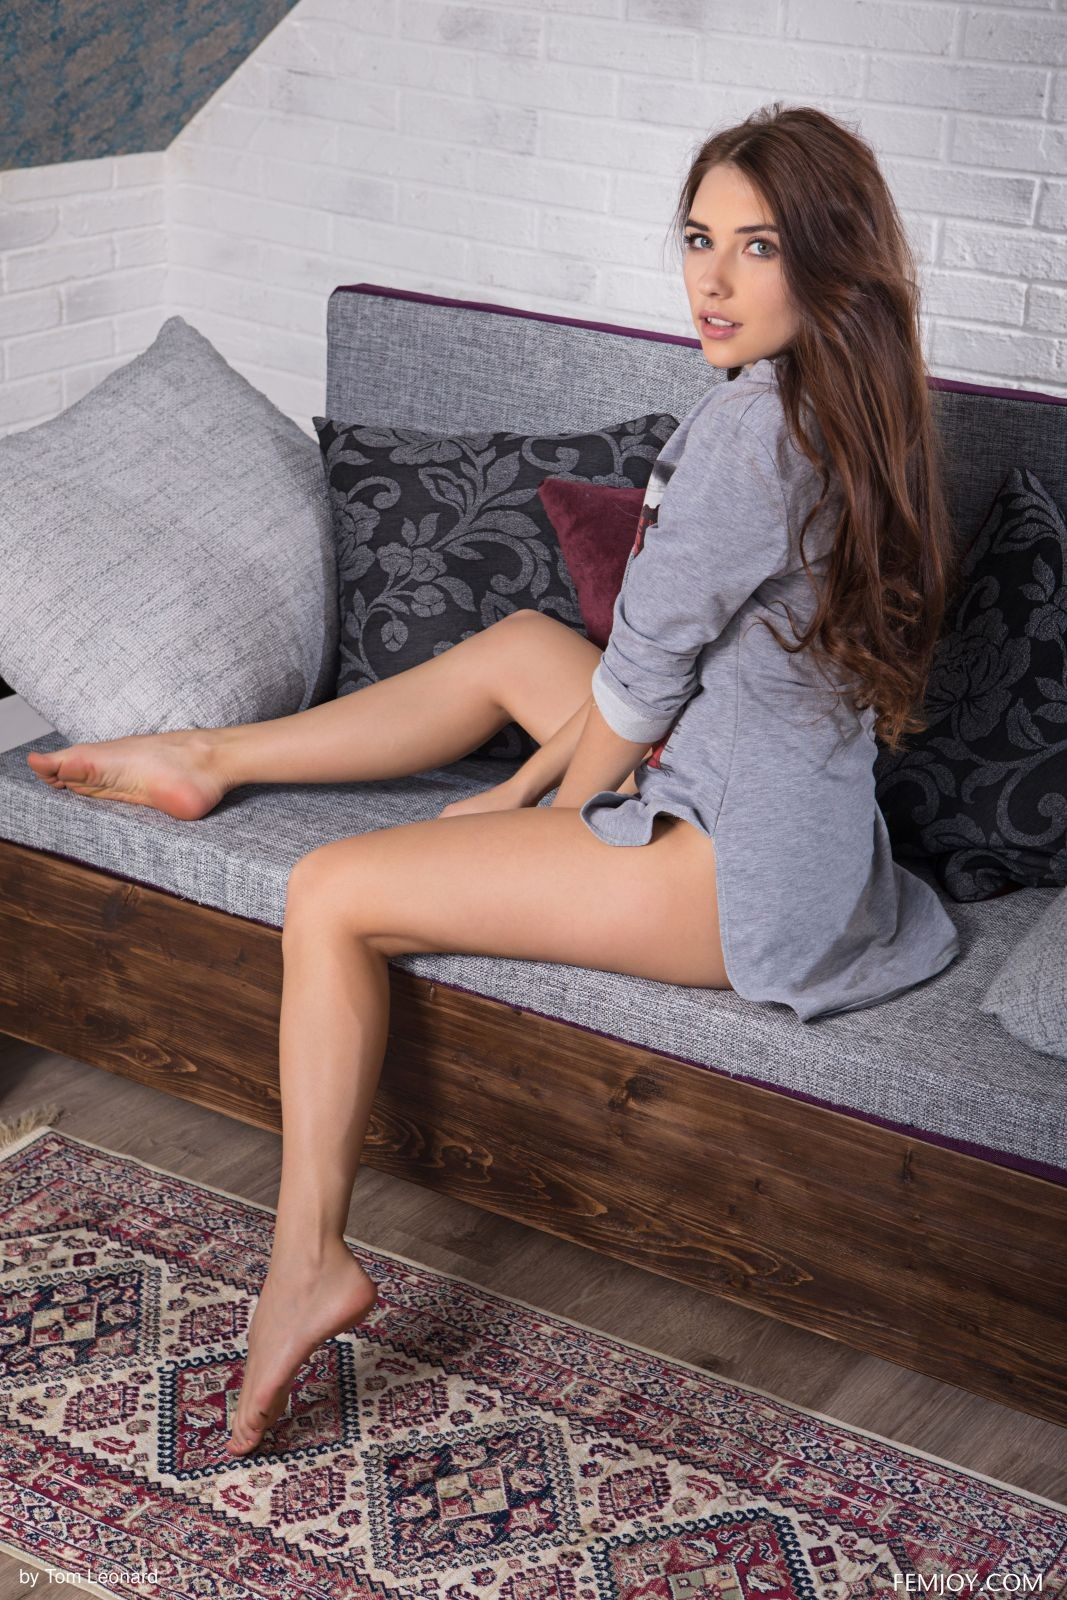 Девушка с аппетитными формами на диване - фото